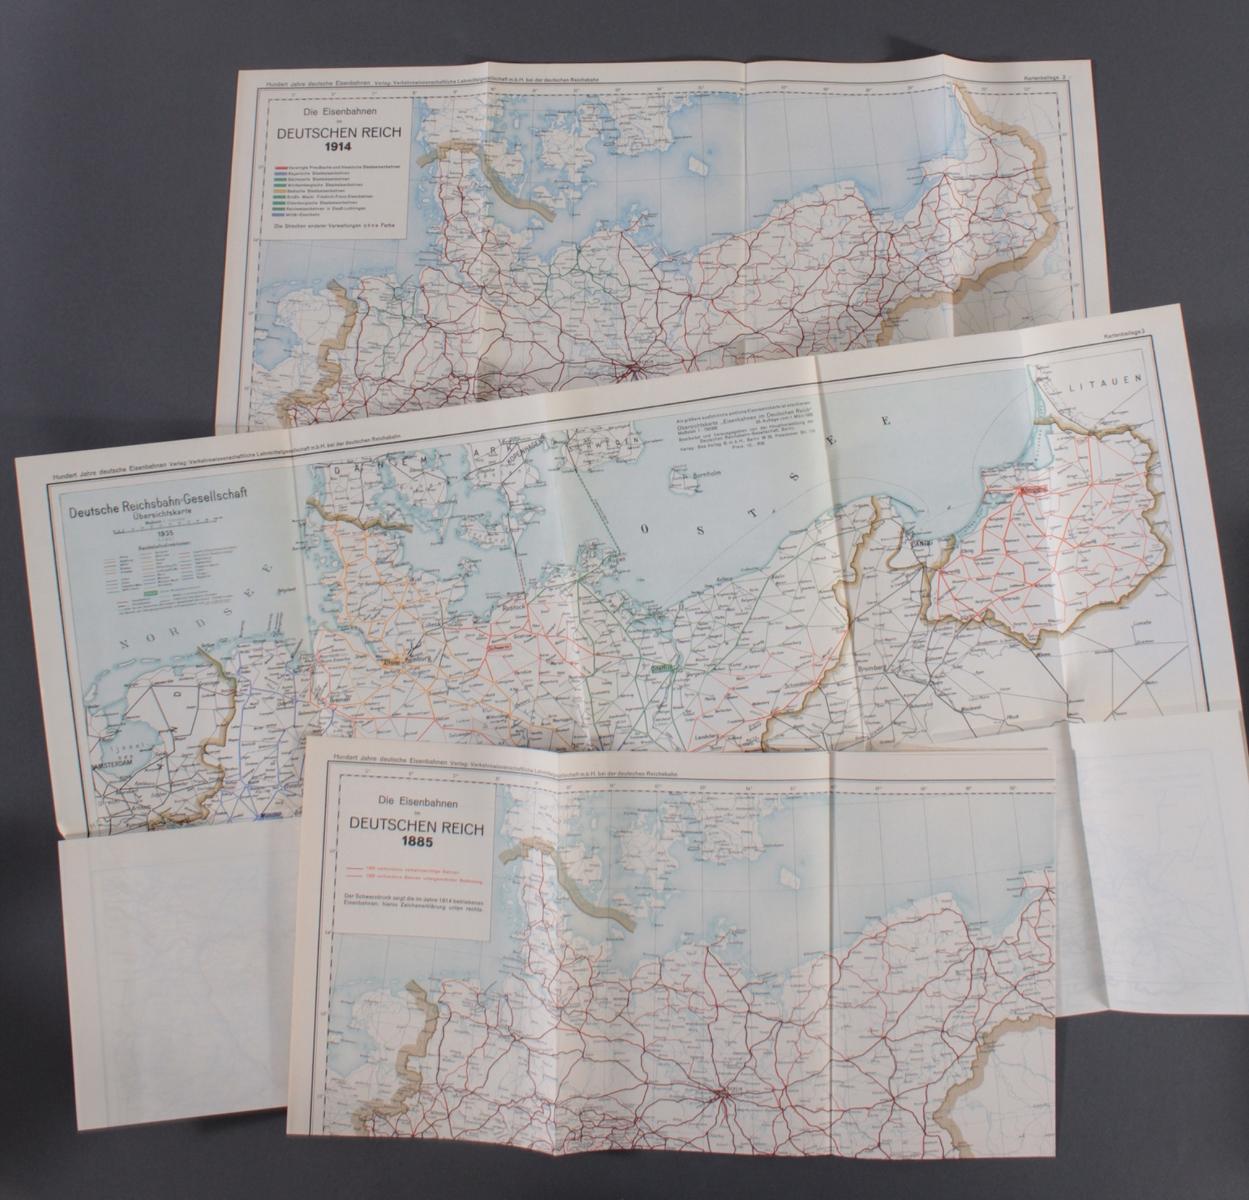 Hundert Jahre deutsche Eisenbahn, Jubiläumsschrift zum hundertjährigen Bestehen-3